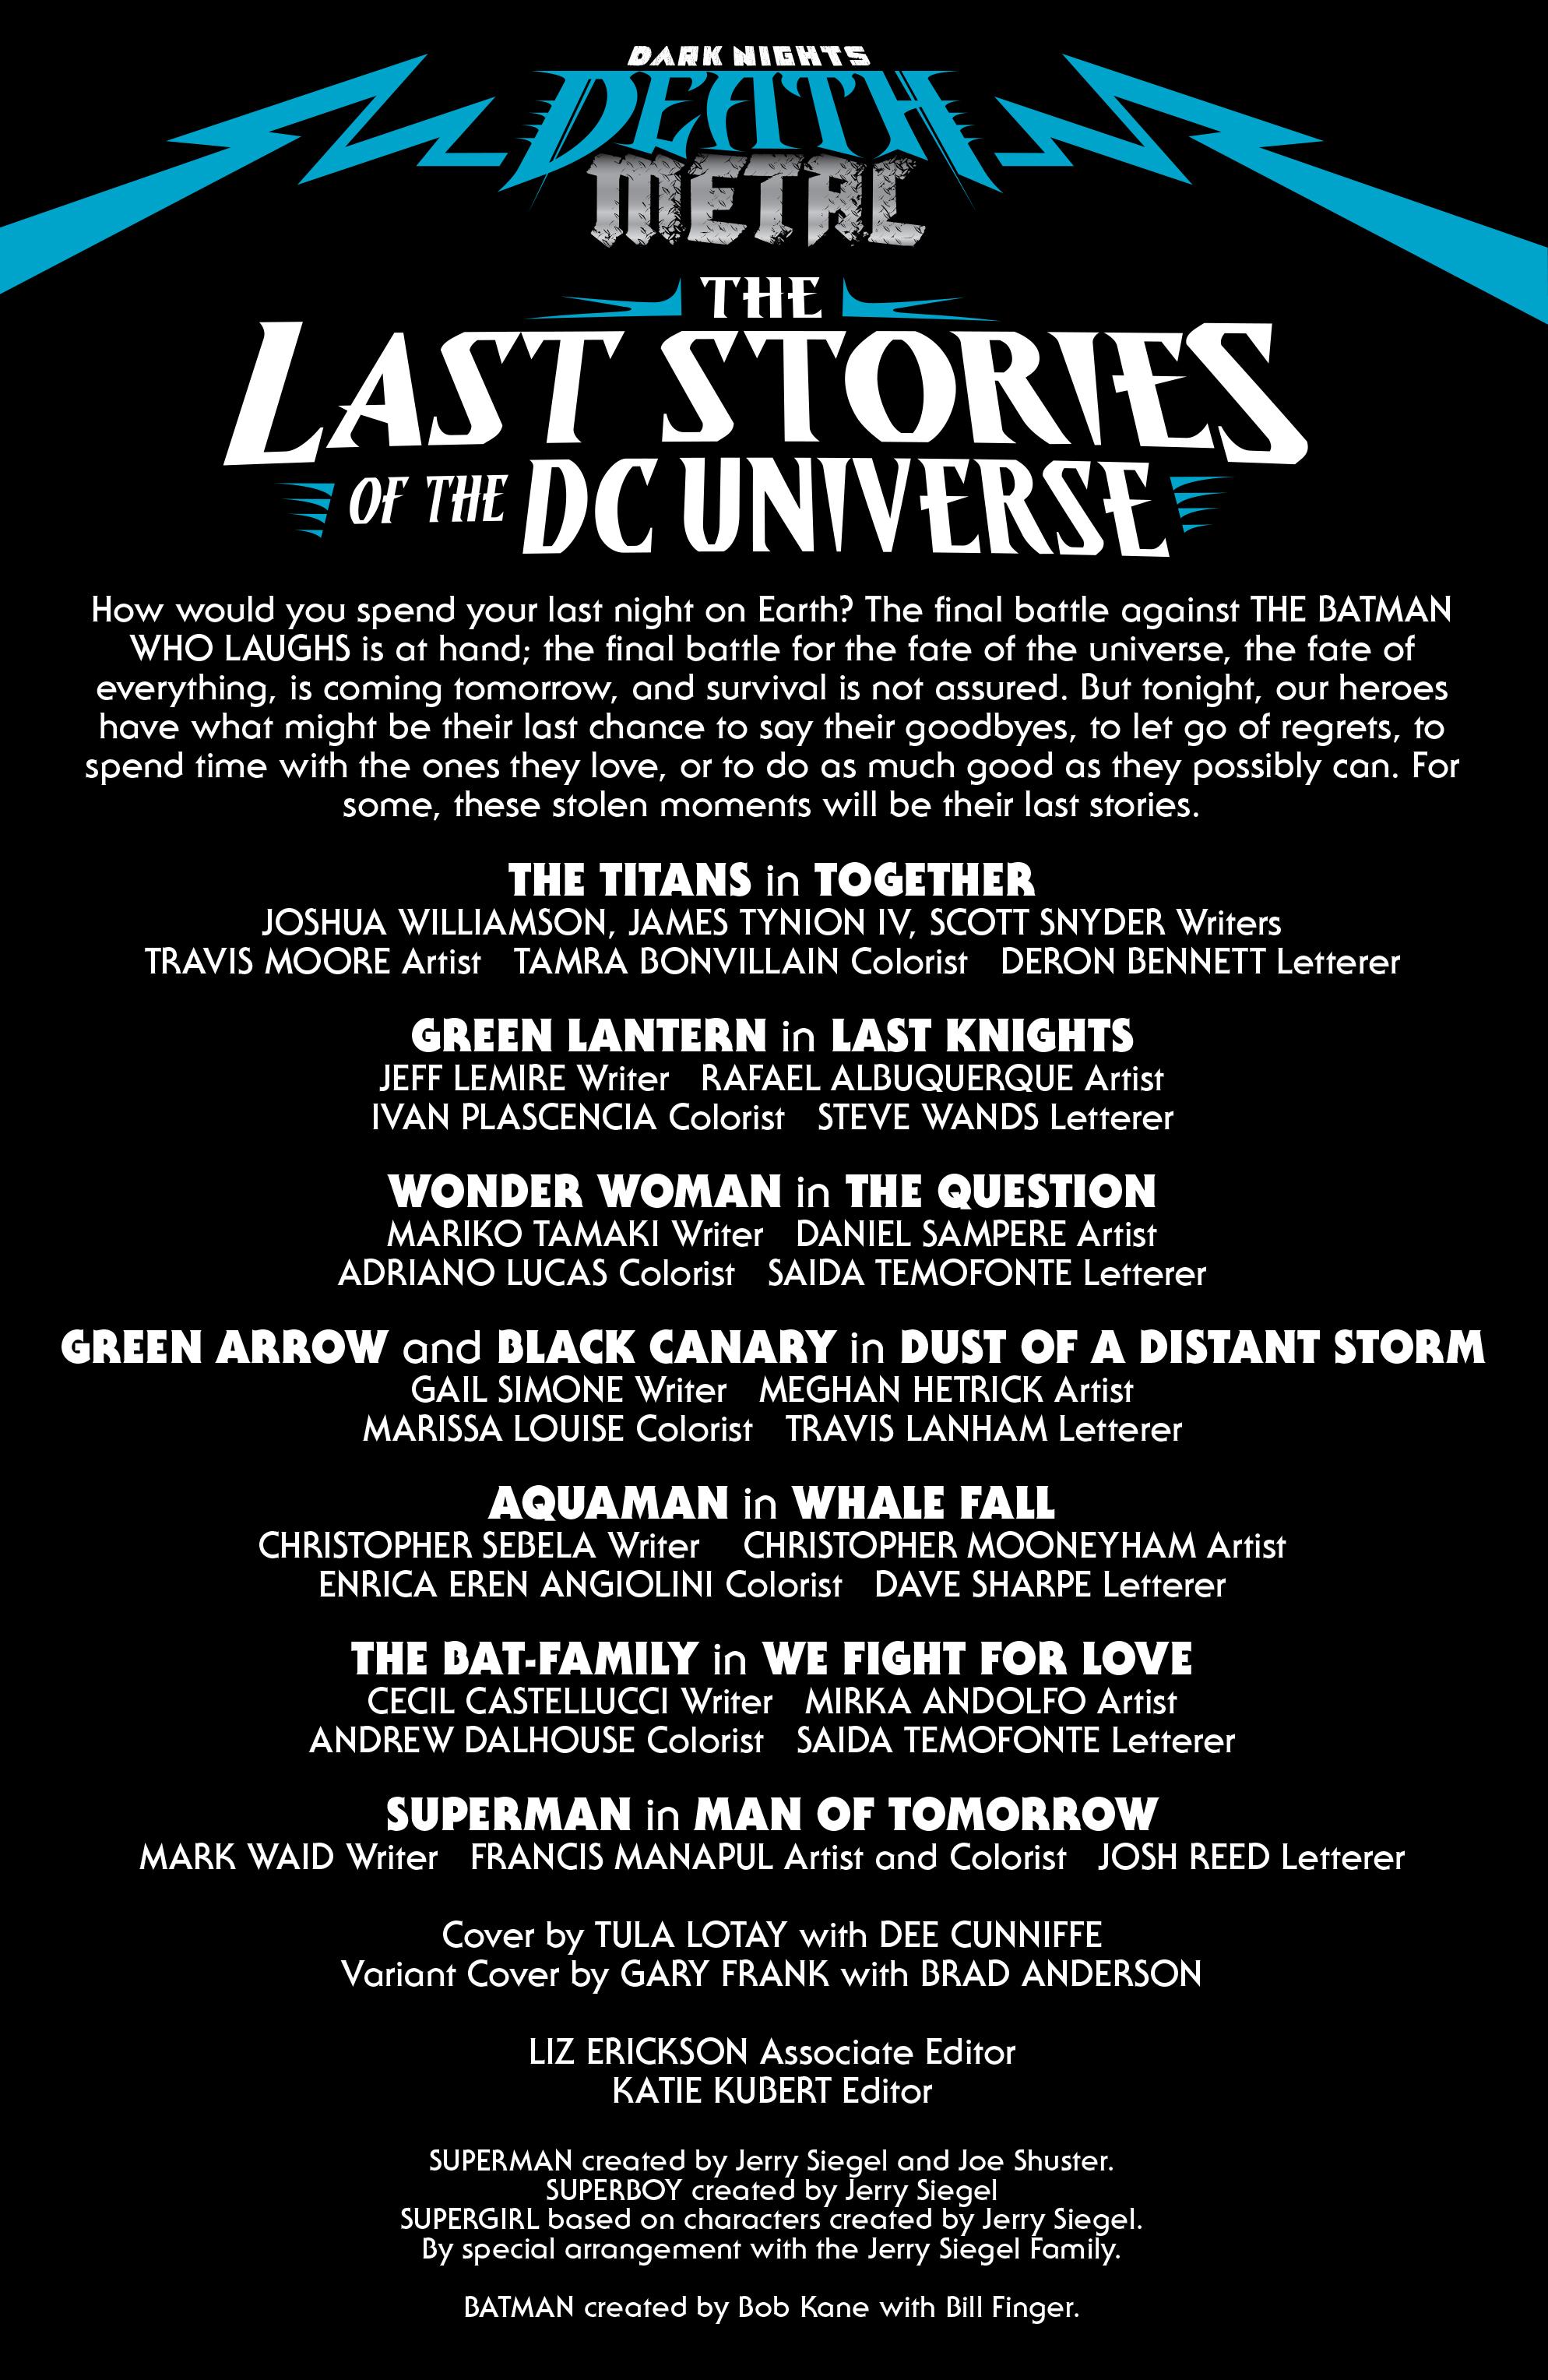 Mark Waid Returns To Superman